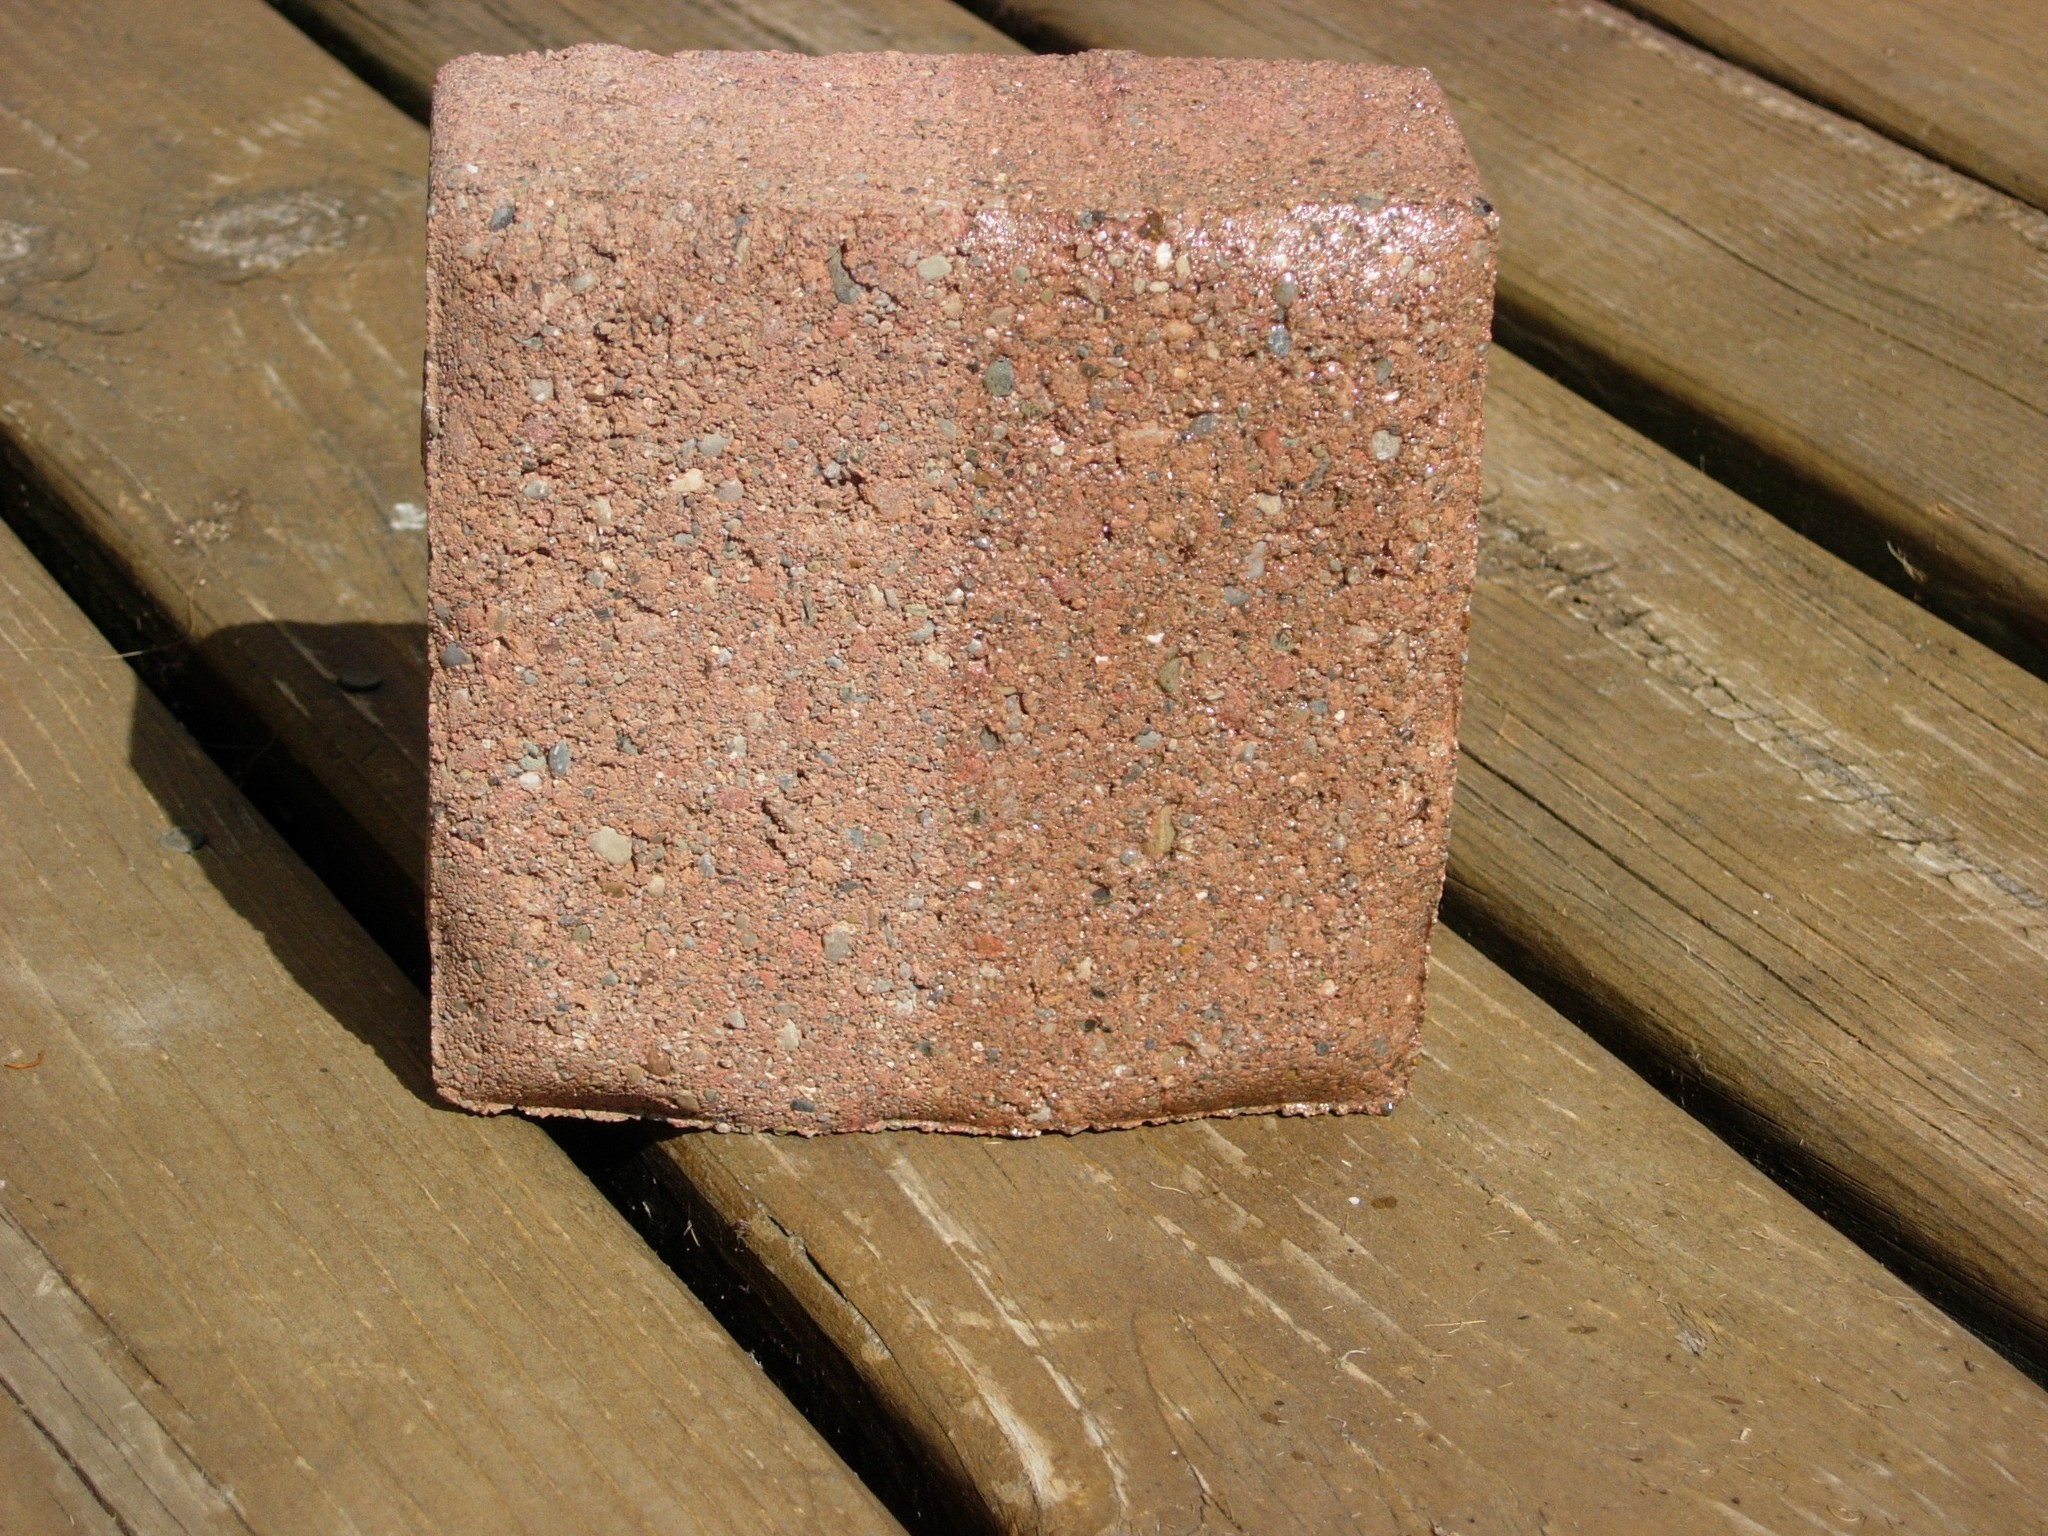 http://www.vseal.com/media/catalog/product/cache/1/image/9df78eab33525d08d6e5fb8d27136e95/P/i/Pic_Concrete_Paver_Red_Brick_Half_Sealed_IG-WB_1ec.jpg